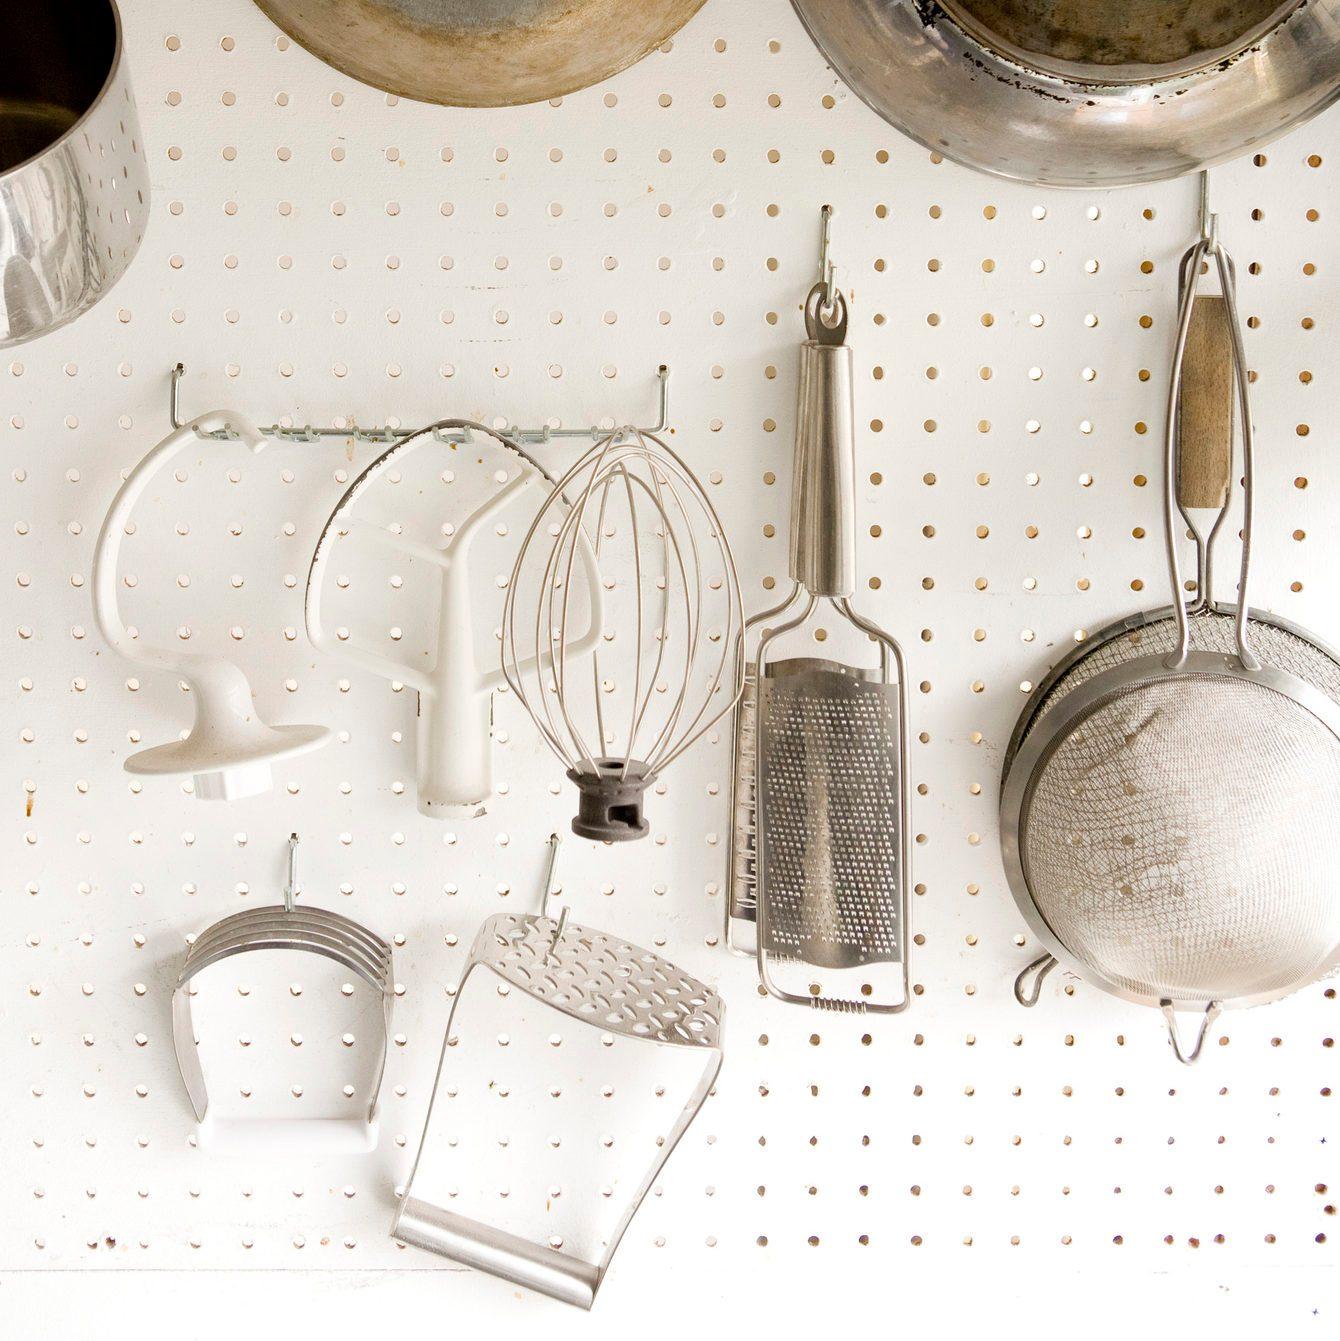 Cooking utensils hanging on white peg board